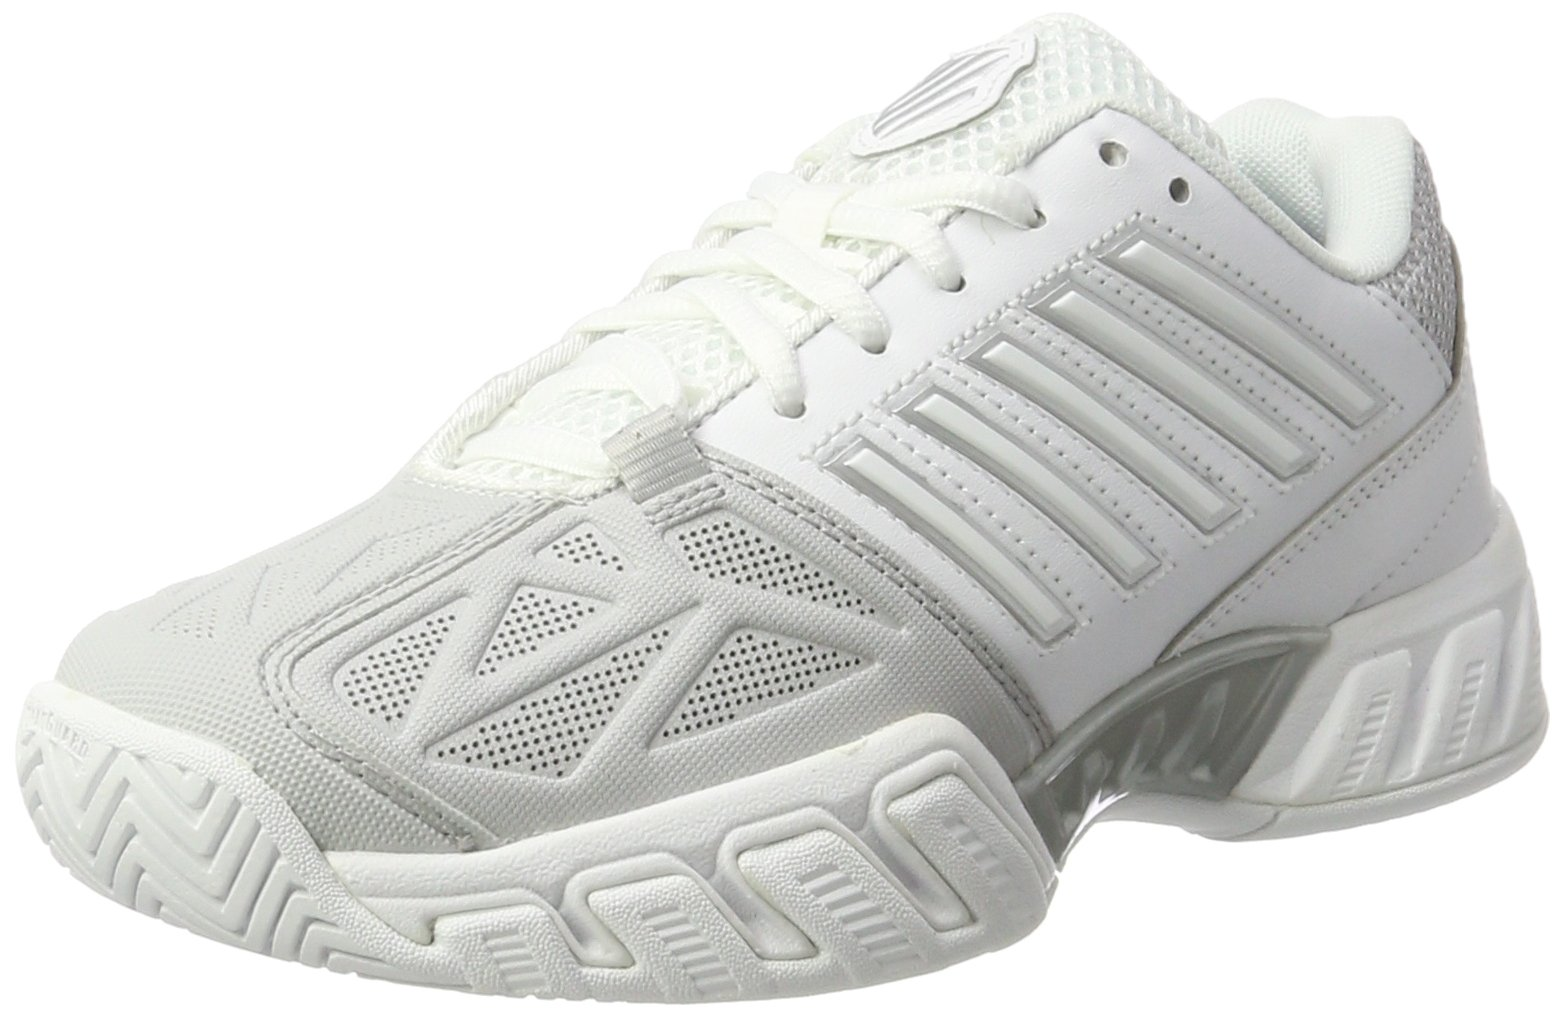 K-Swiss Bigshot Light 3 Womens Tennis Shoe (White/Silver, 8 M US) by K-Swiss